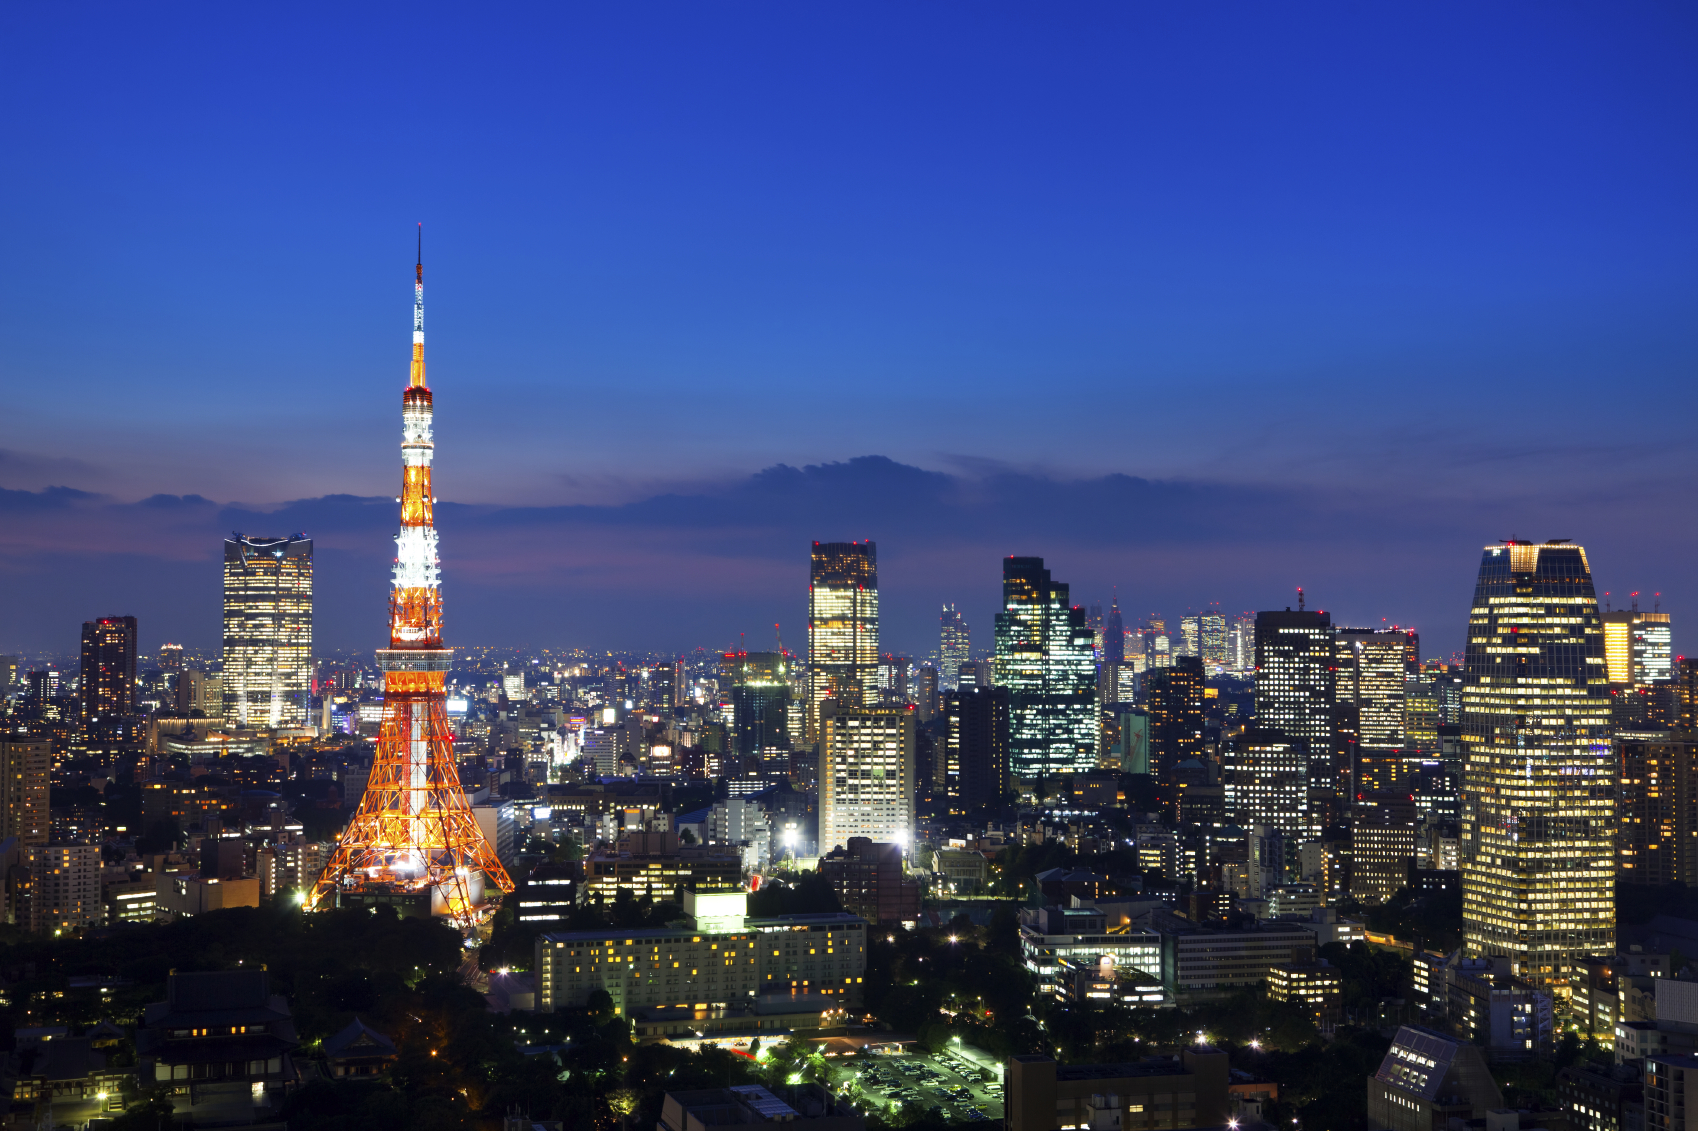 tokyo dark city skyline - photo #25